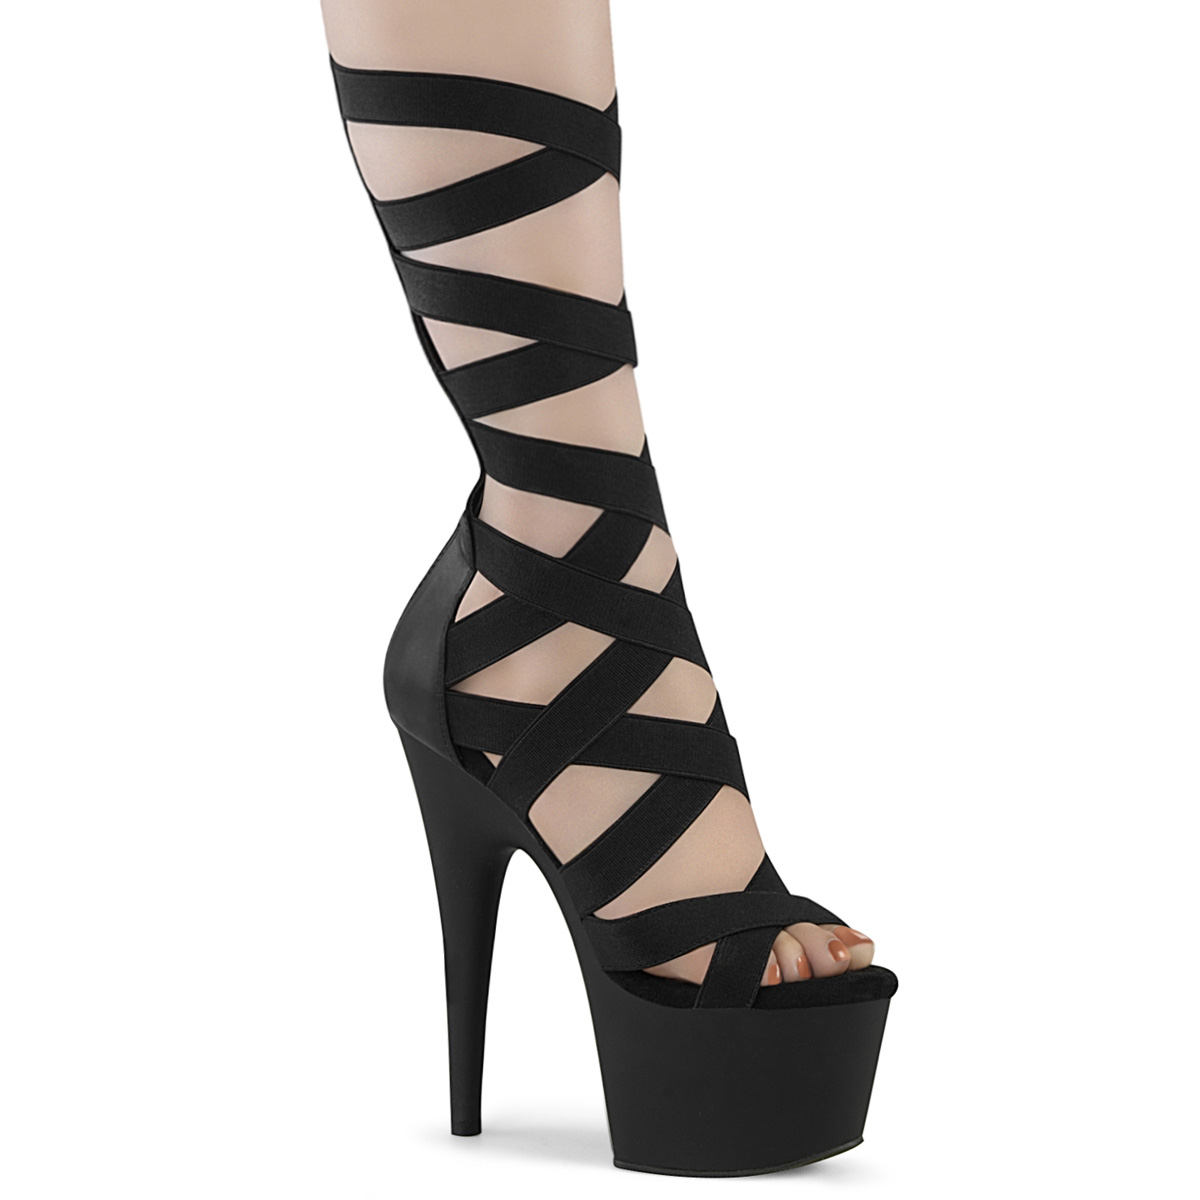 6 Heel, 1 3/4 PF Strappy T-Strap Close Back Sandal